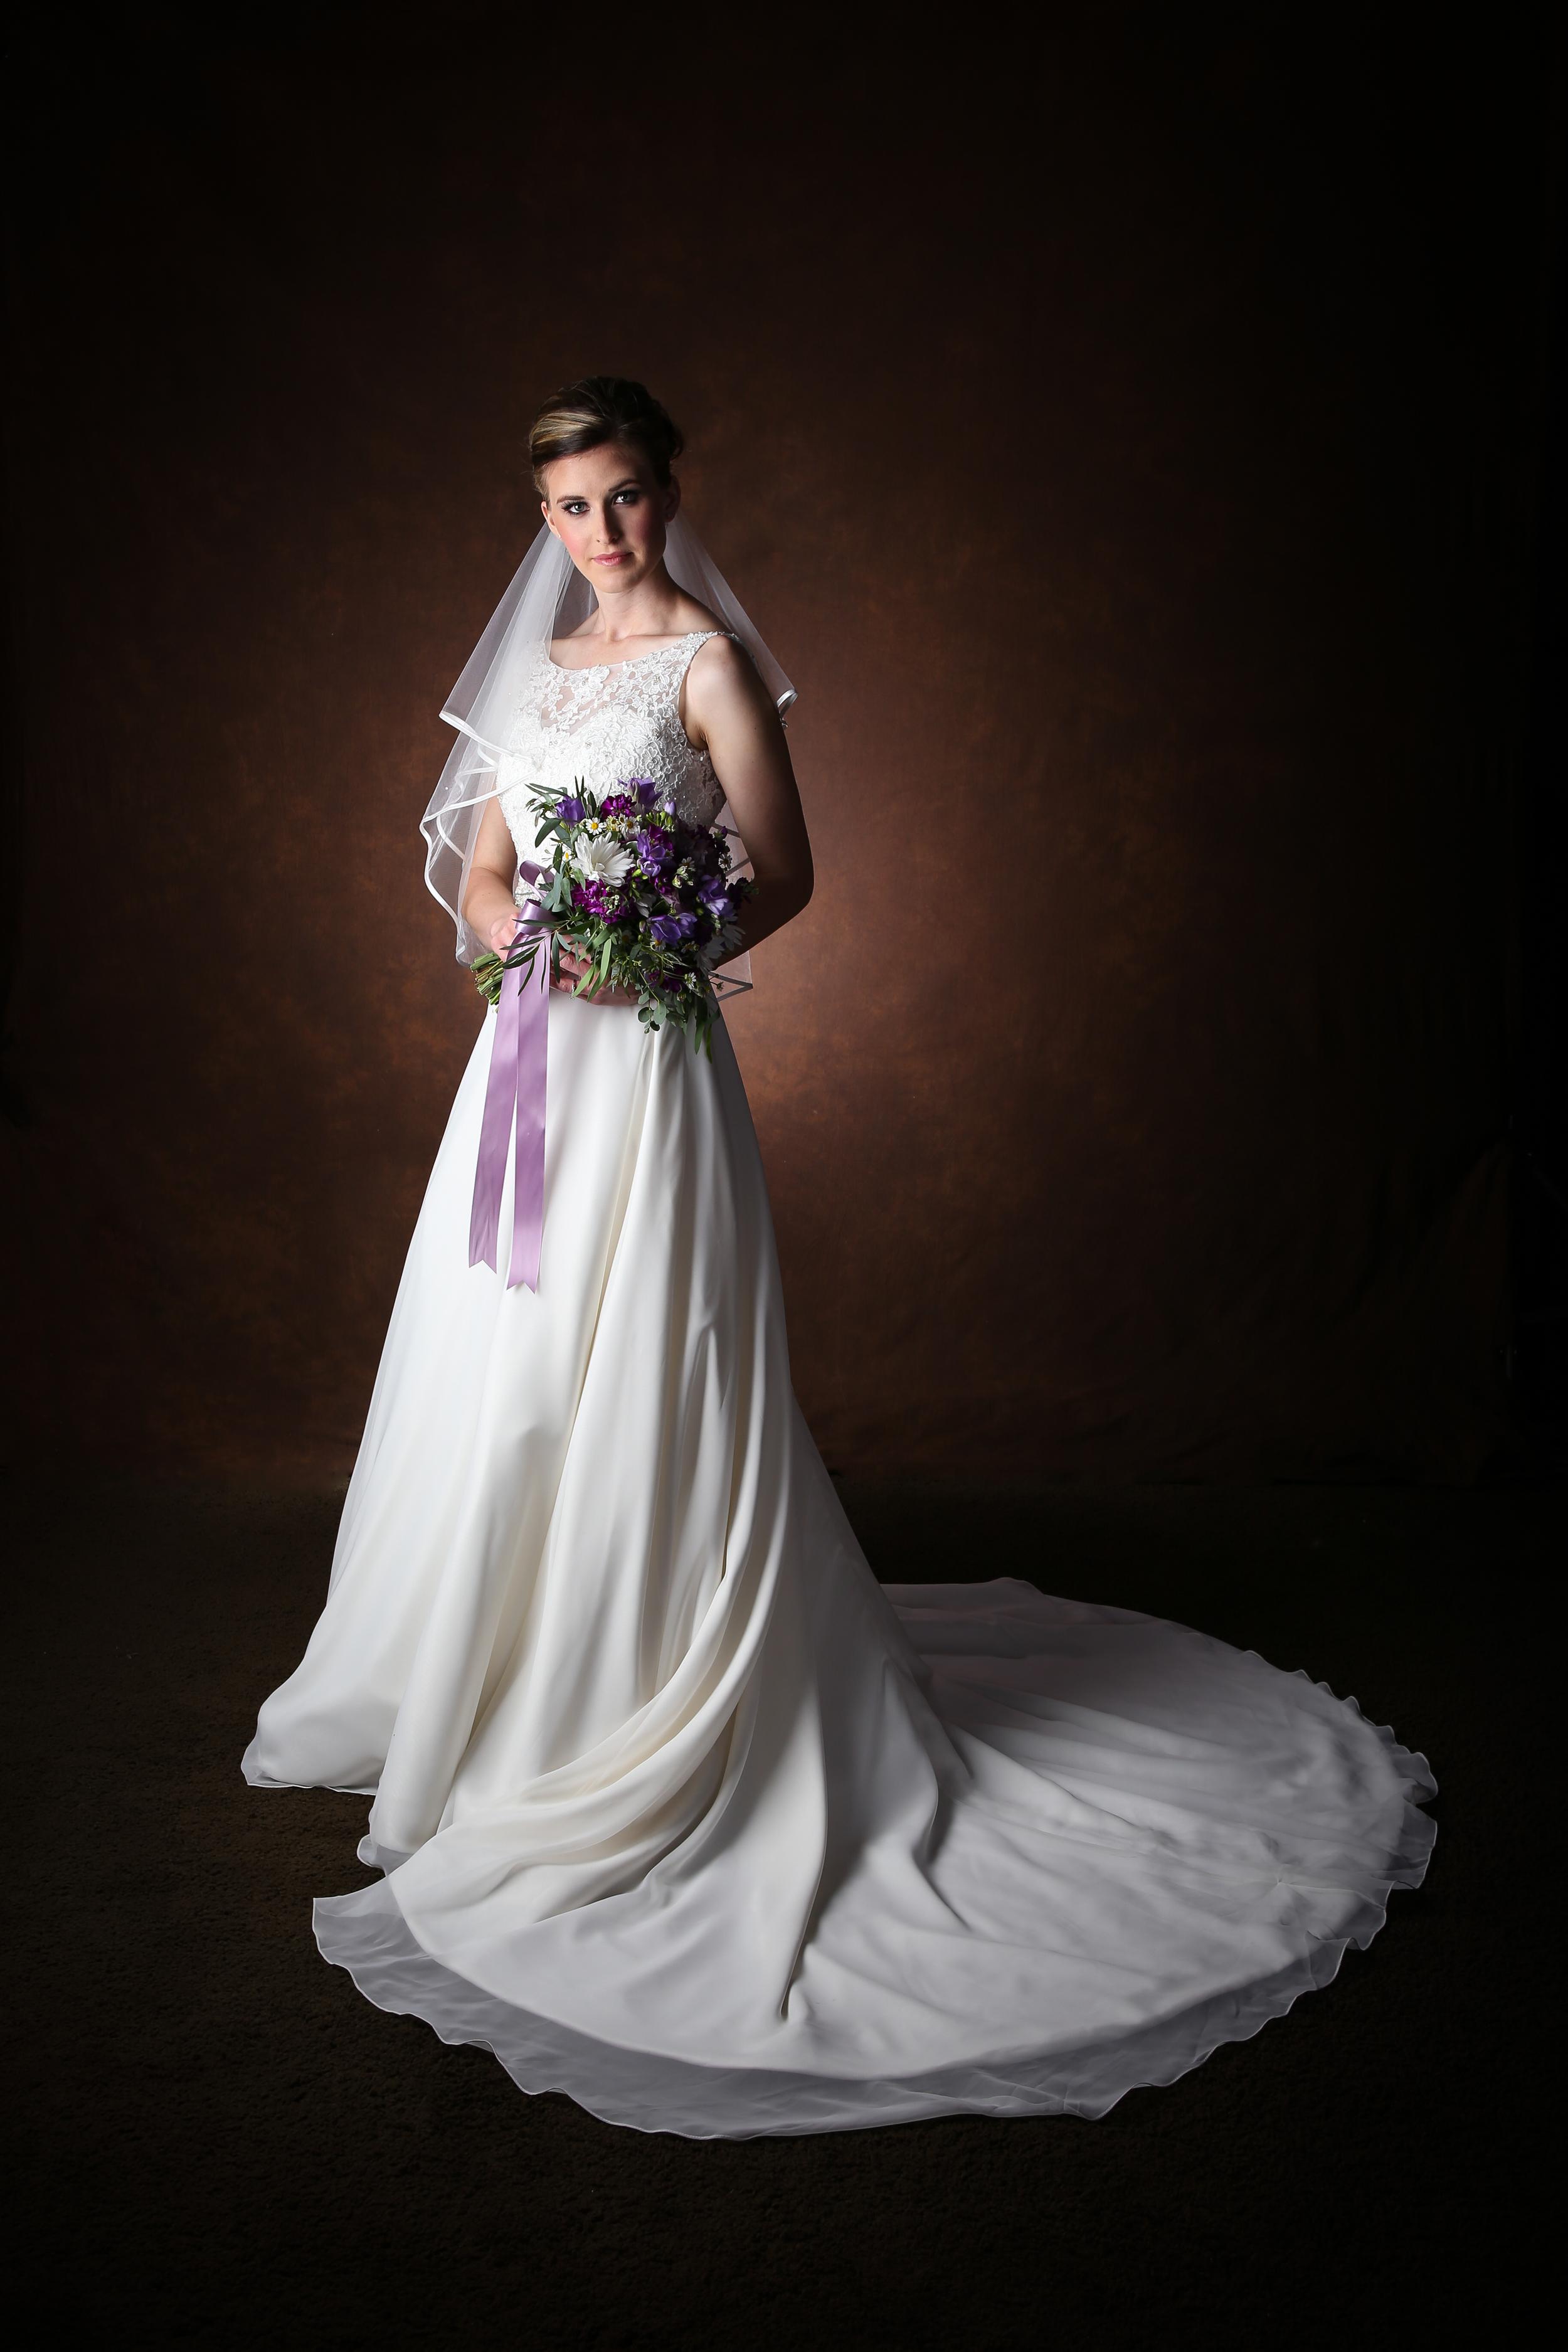 Bountiful Wedding studio Bridal photography